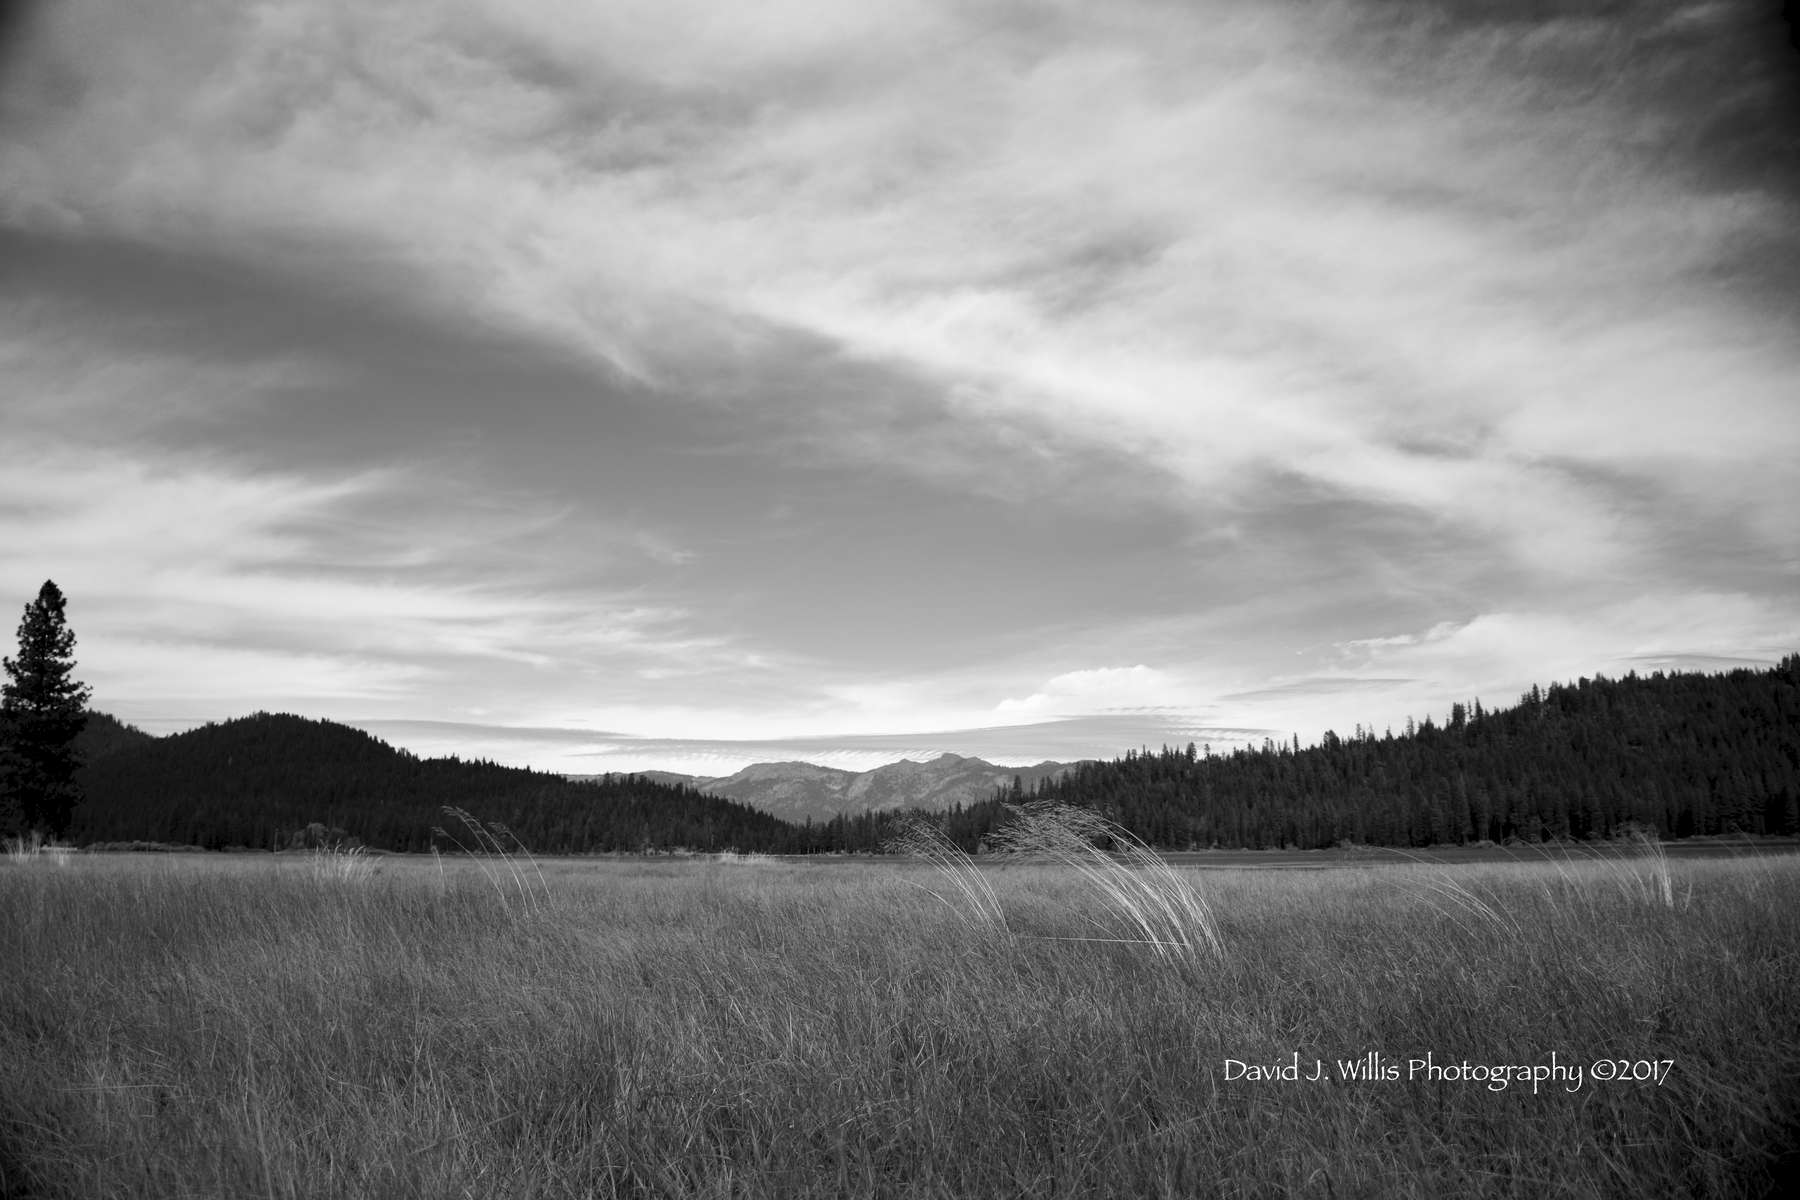 Round Valley Resevoir, Windblown Grasses, Keddie Ridge, Plumas County